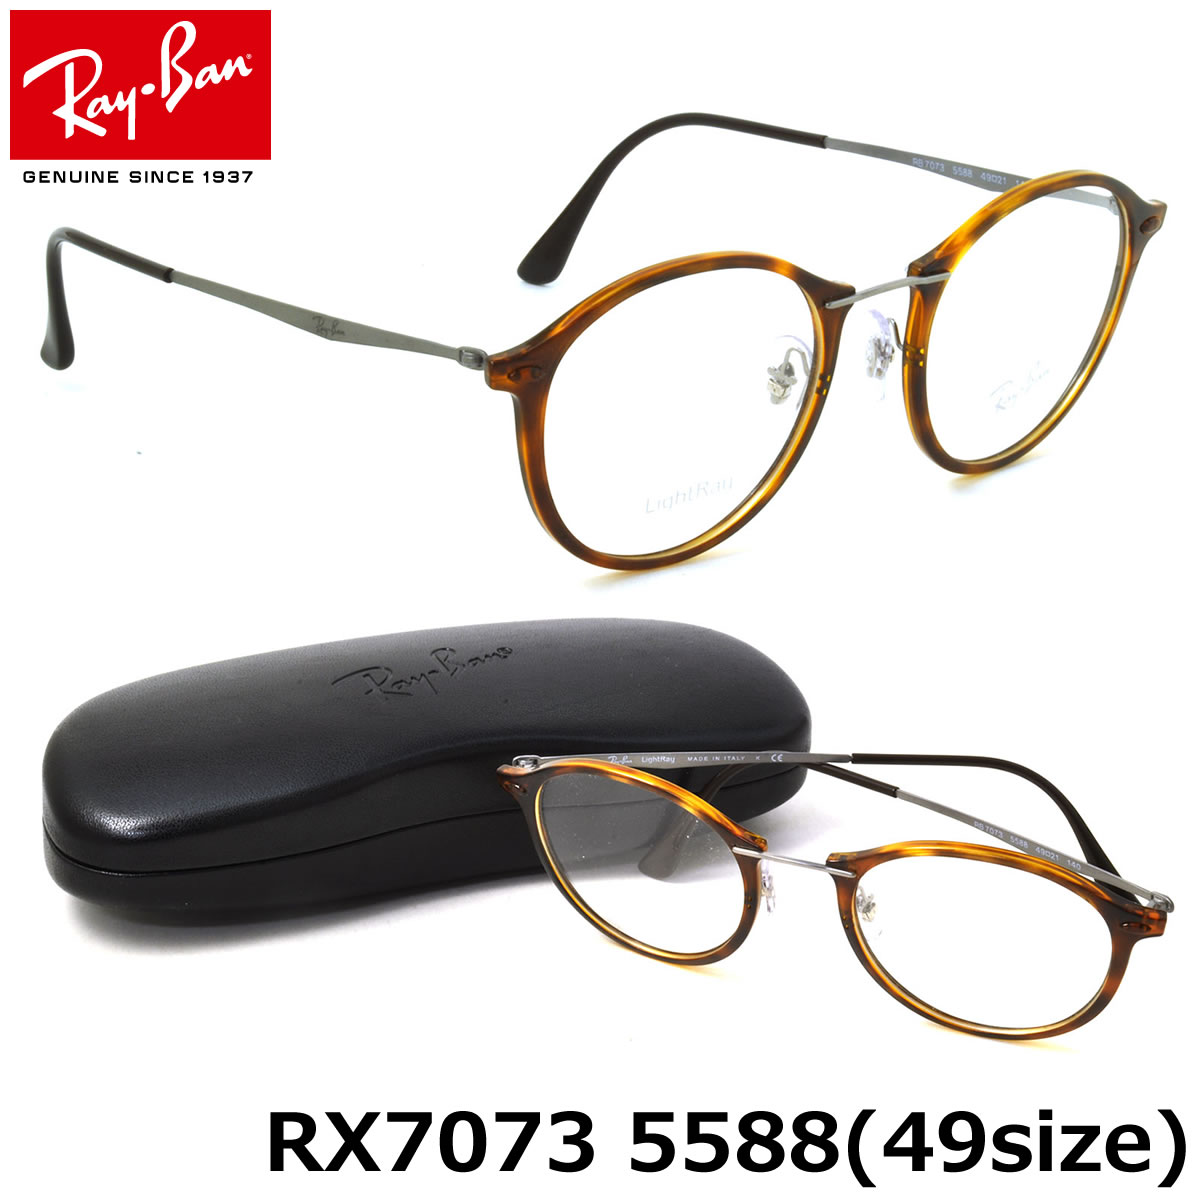 96625fb4d0 (Ray-Ban) tech light Ray glasses frames RX7073 5588 49 size round round  glasses ROUND Ray-Ban RAYBAN TECH ROUND LIGHT RAY men s women s